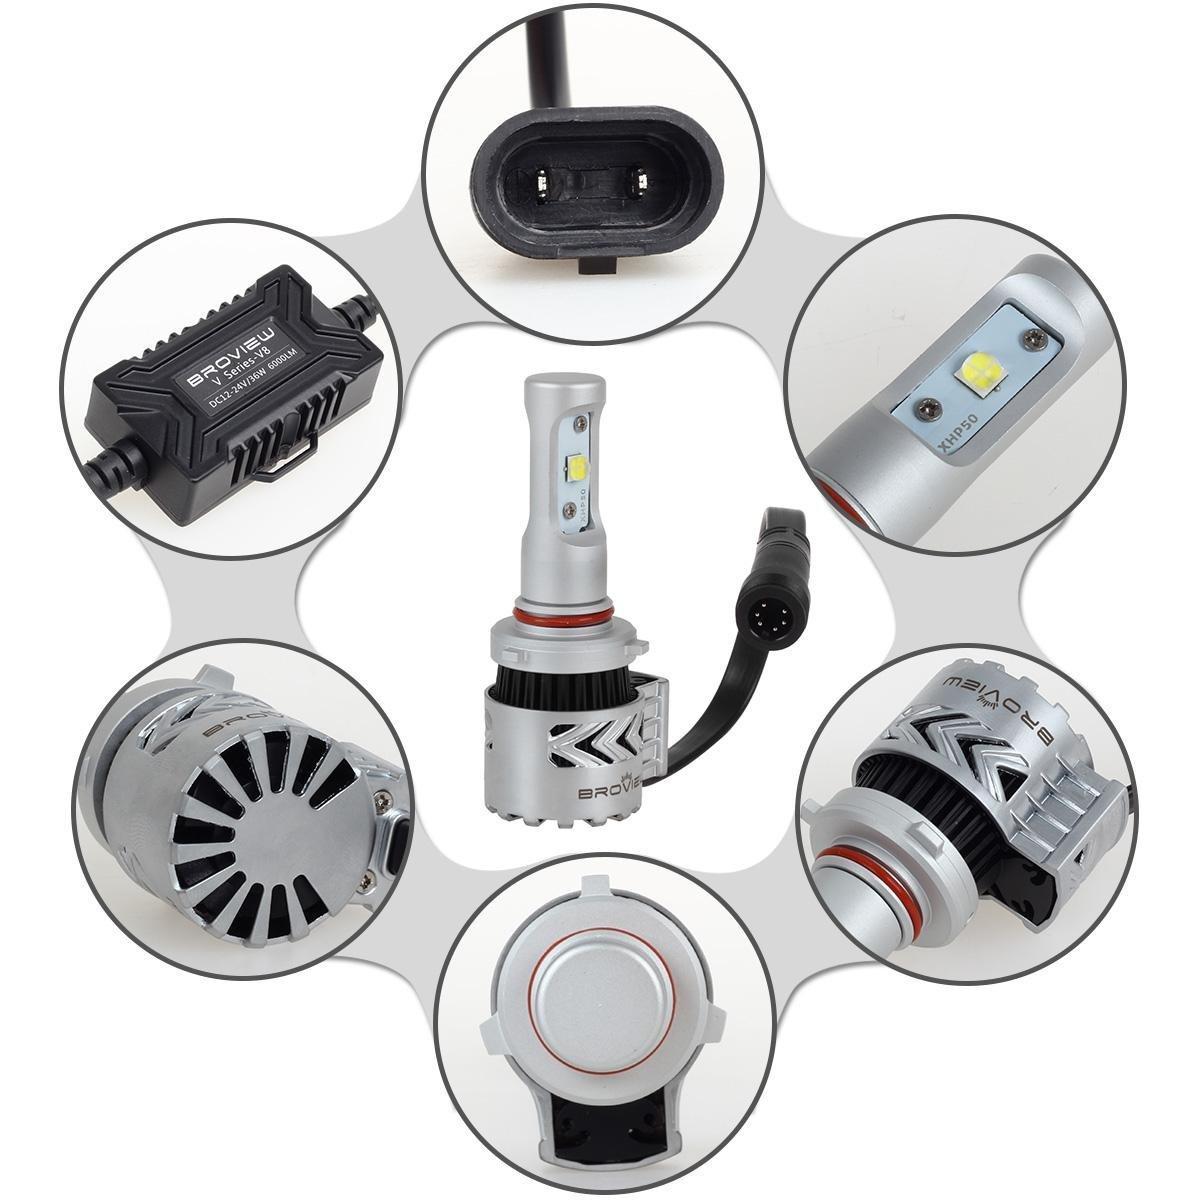 Broview V8 Led 9005hb3h10 Headlight Bulbs 72w 12000lm Suzuki Kizashi Wiring Harness 6500k White Cree Aftermarket Headlights For Replace Hid Xenon 2pcs Set